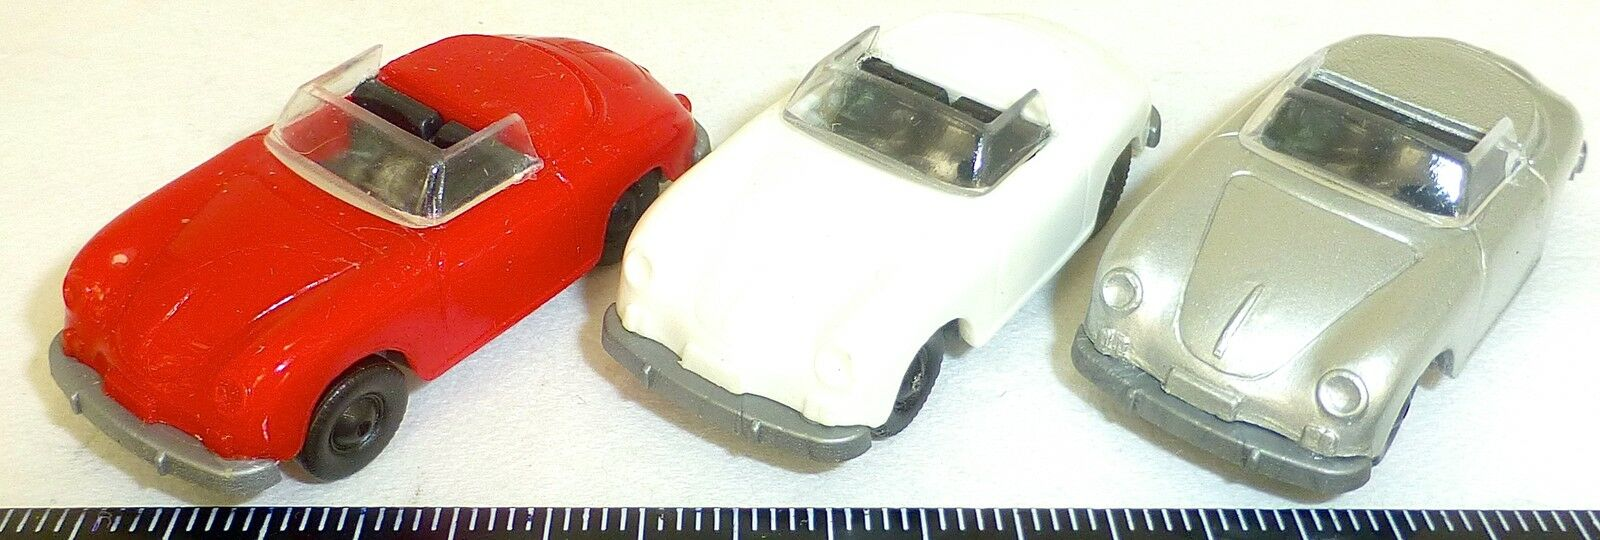 3x Porsche 356 Cabrio 1x Rojo 1x 1x 1x PLATA 1x Beige IMU EUROMODELL 1 87 H0 9be22c